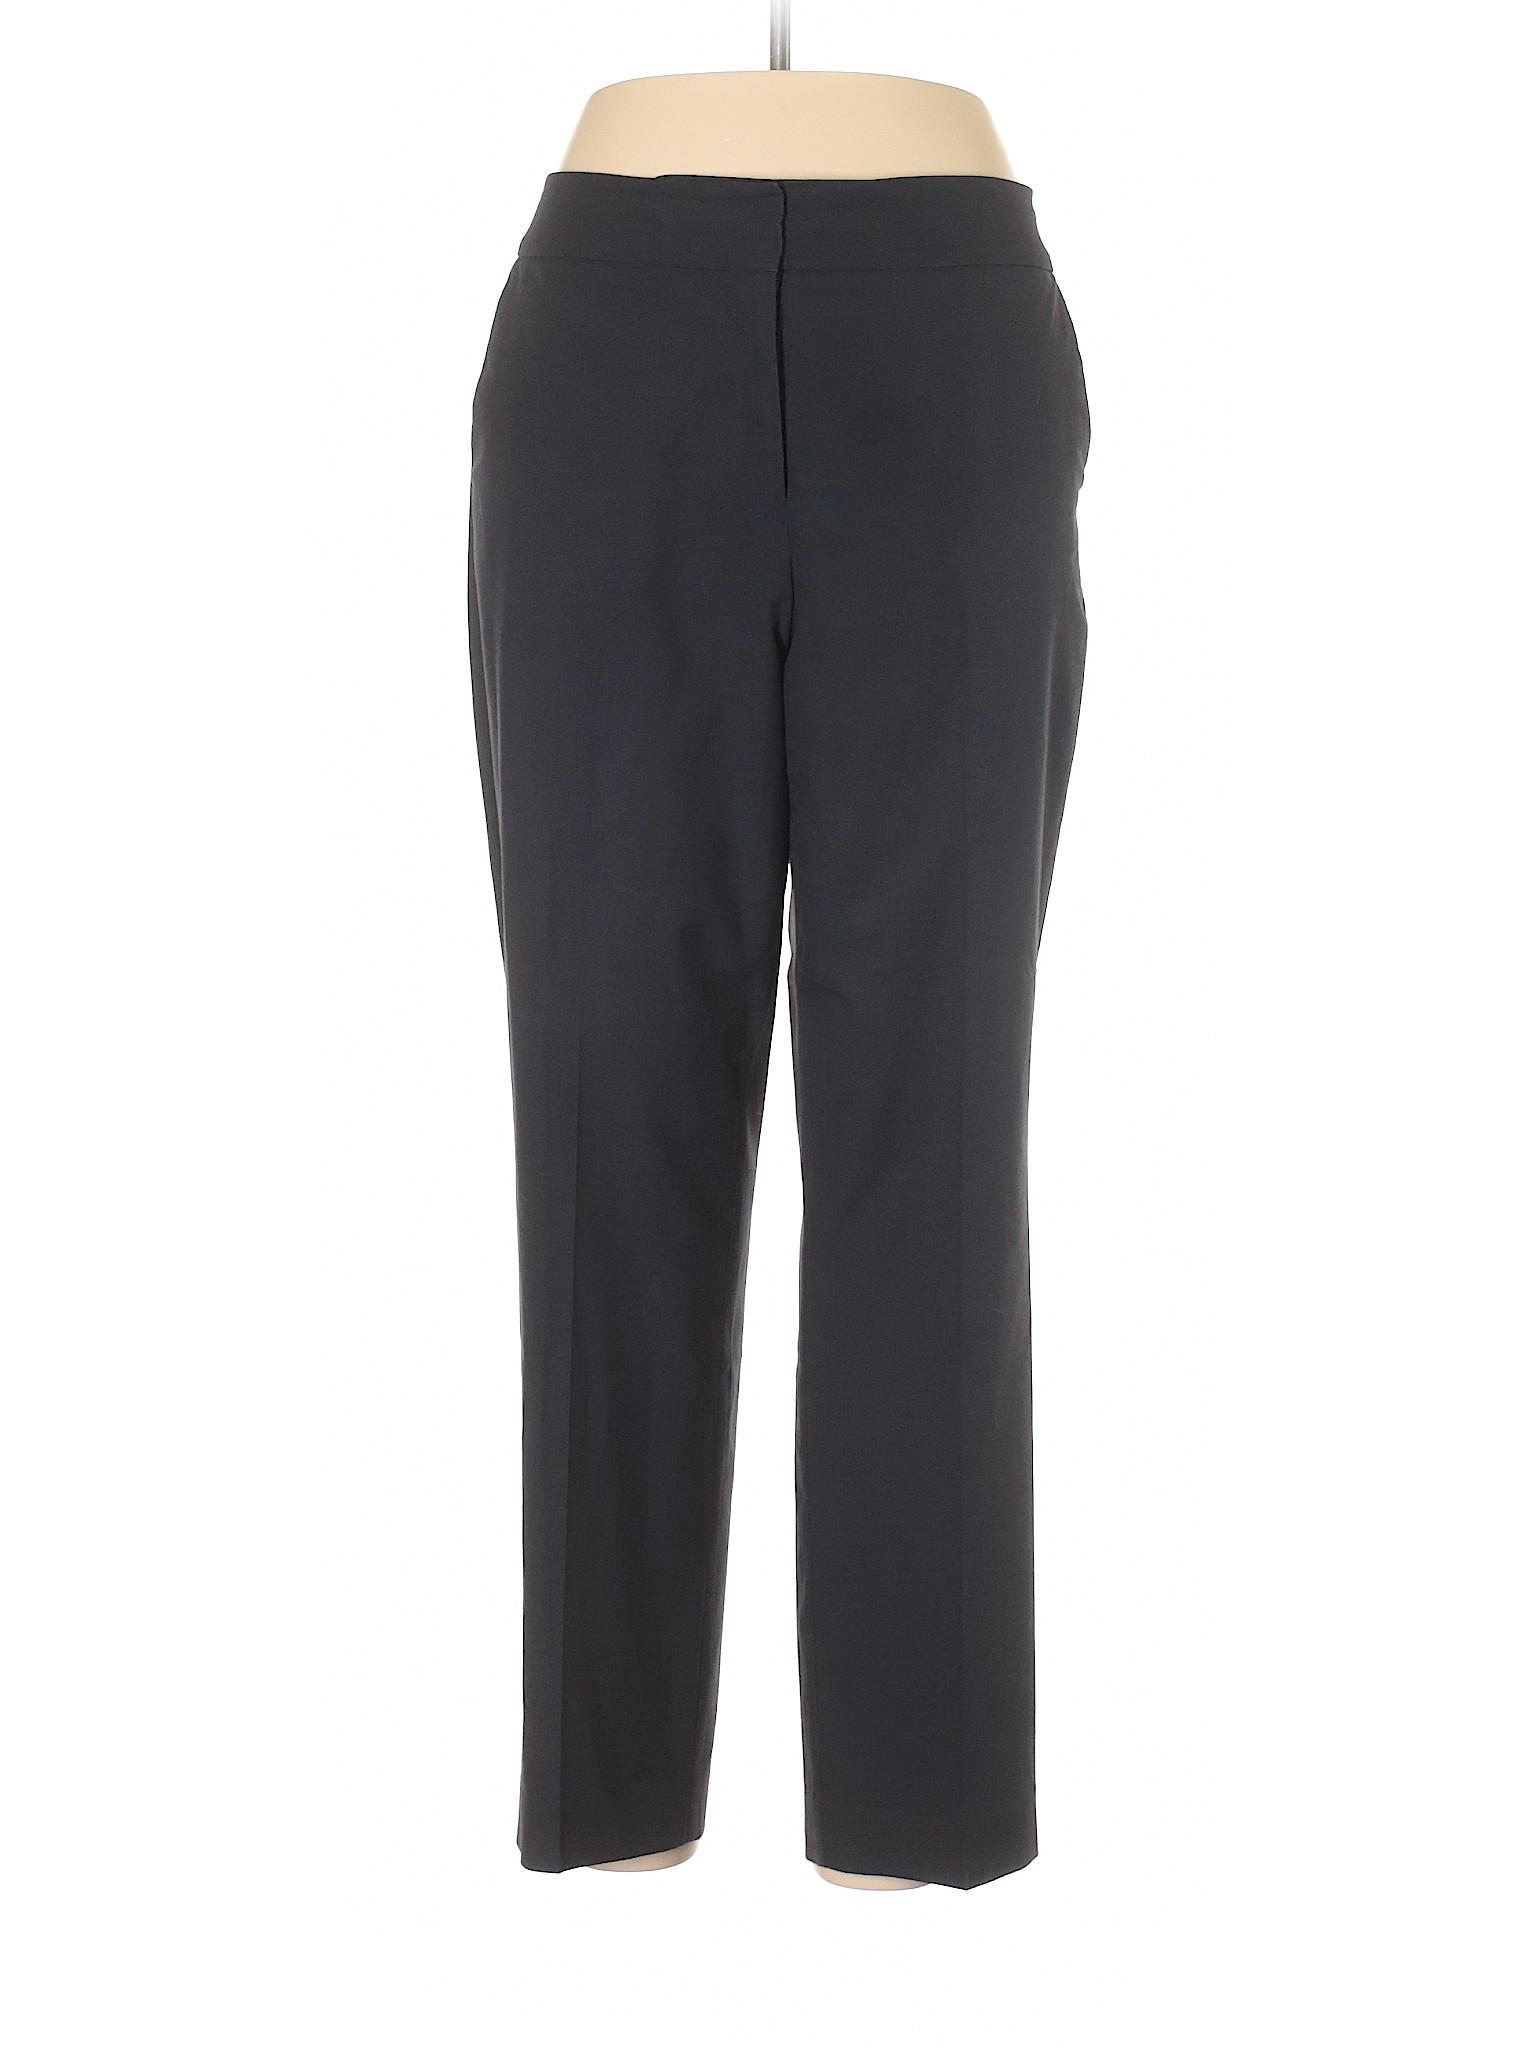 Winter Boutique Pants Factory Taylor Ann Dress Axdn8p6O